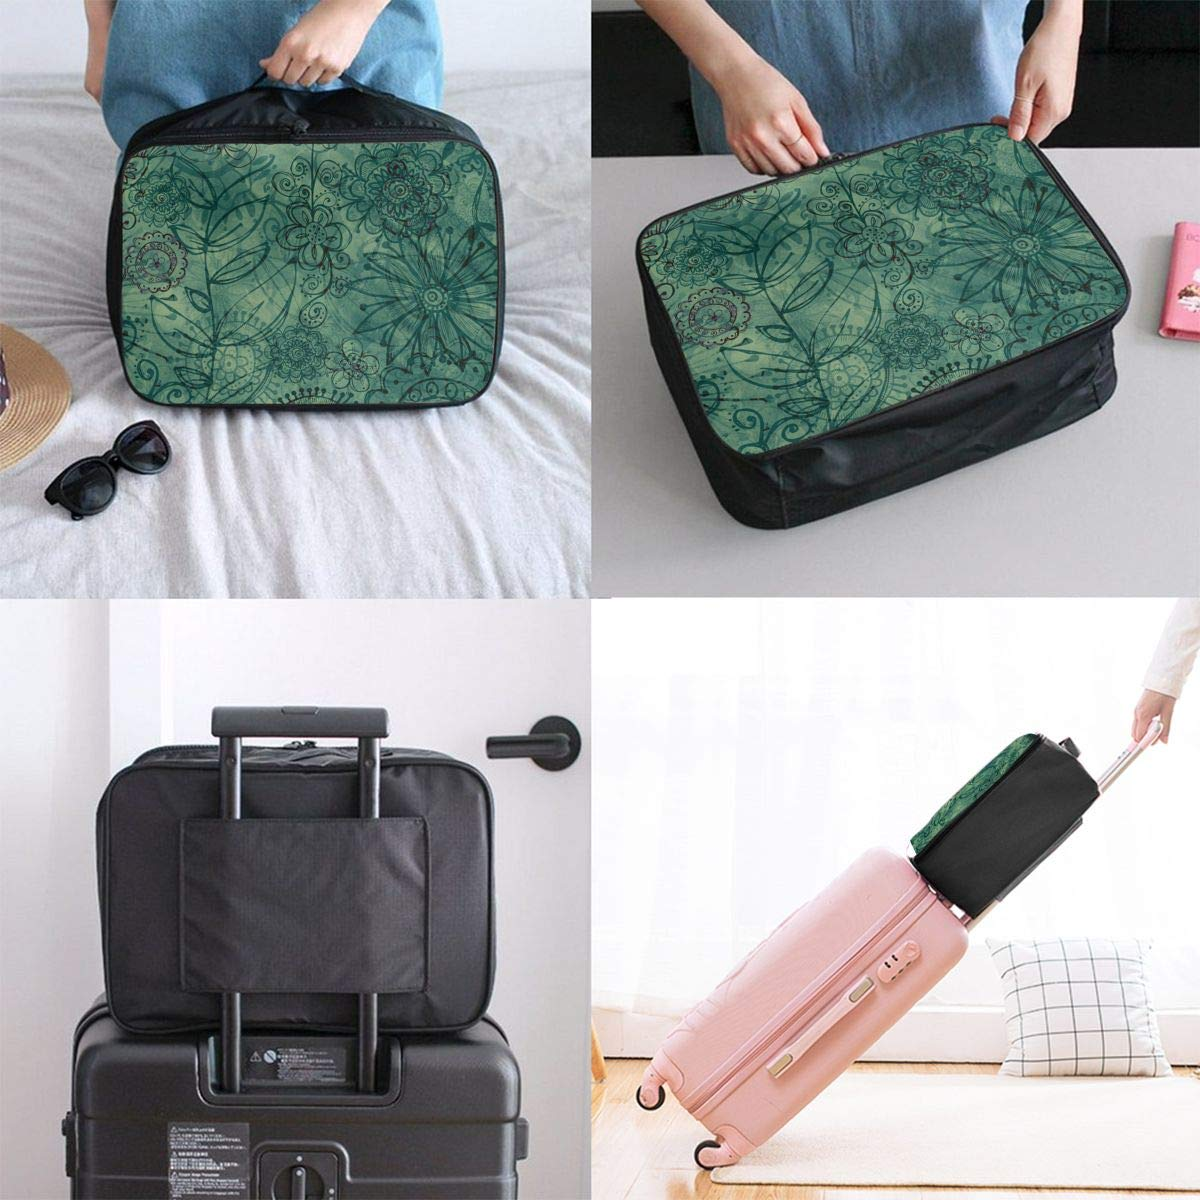 ADGAI Drawing Doodle Canvas Travel Weekender Bag,Fashion Custom Lightweight Large Capacity Portable Luggage Bag,Suitcase Trolley Bag